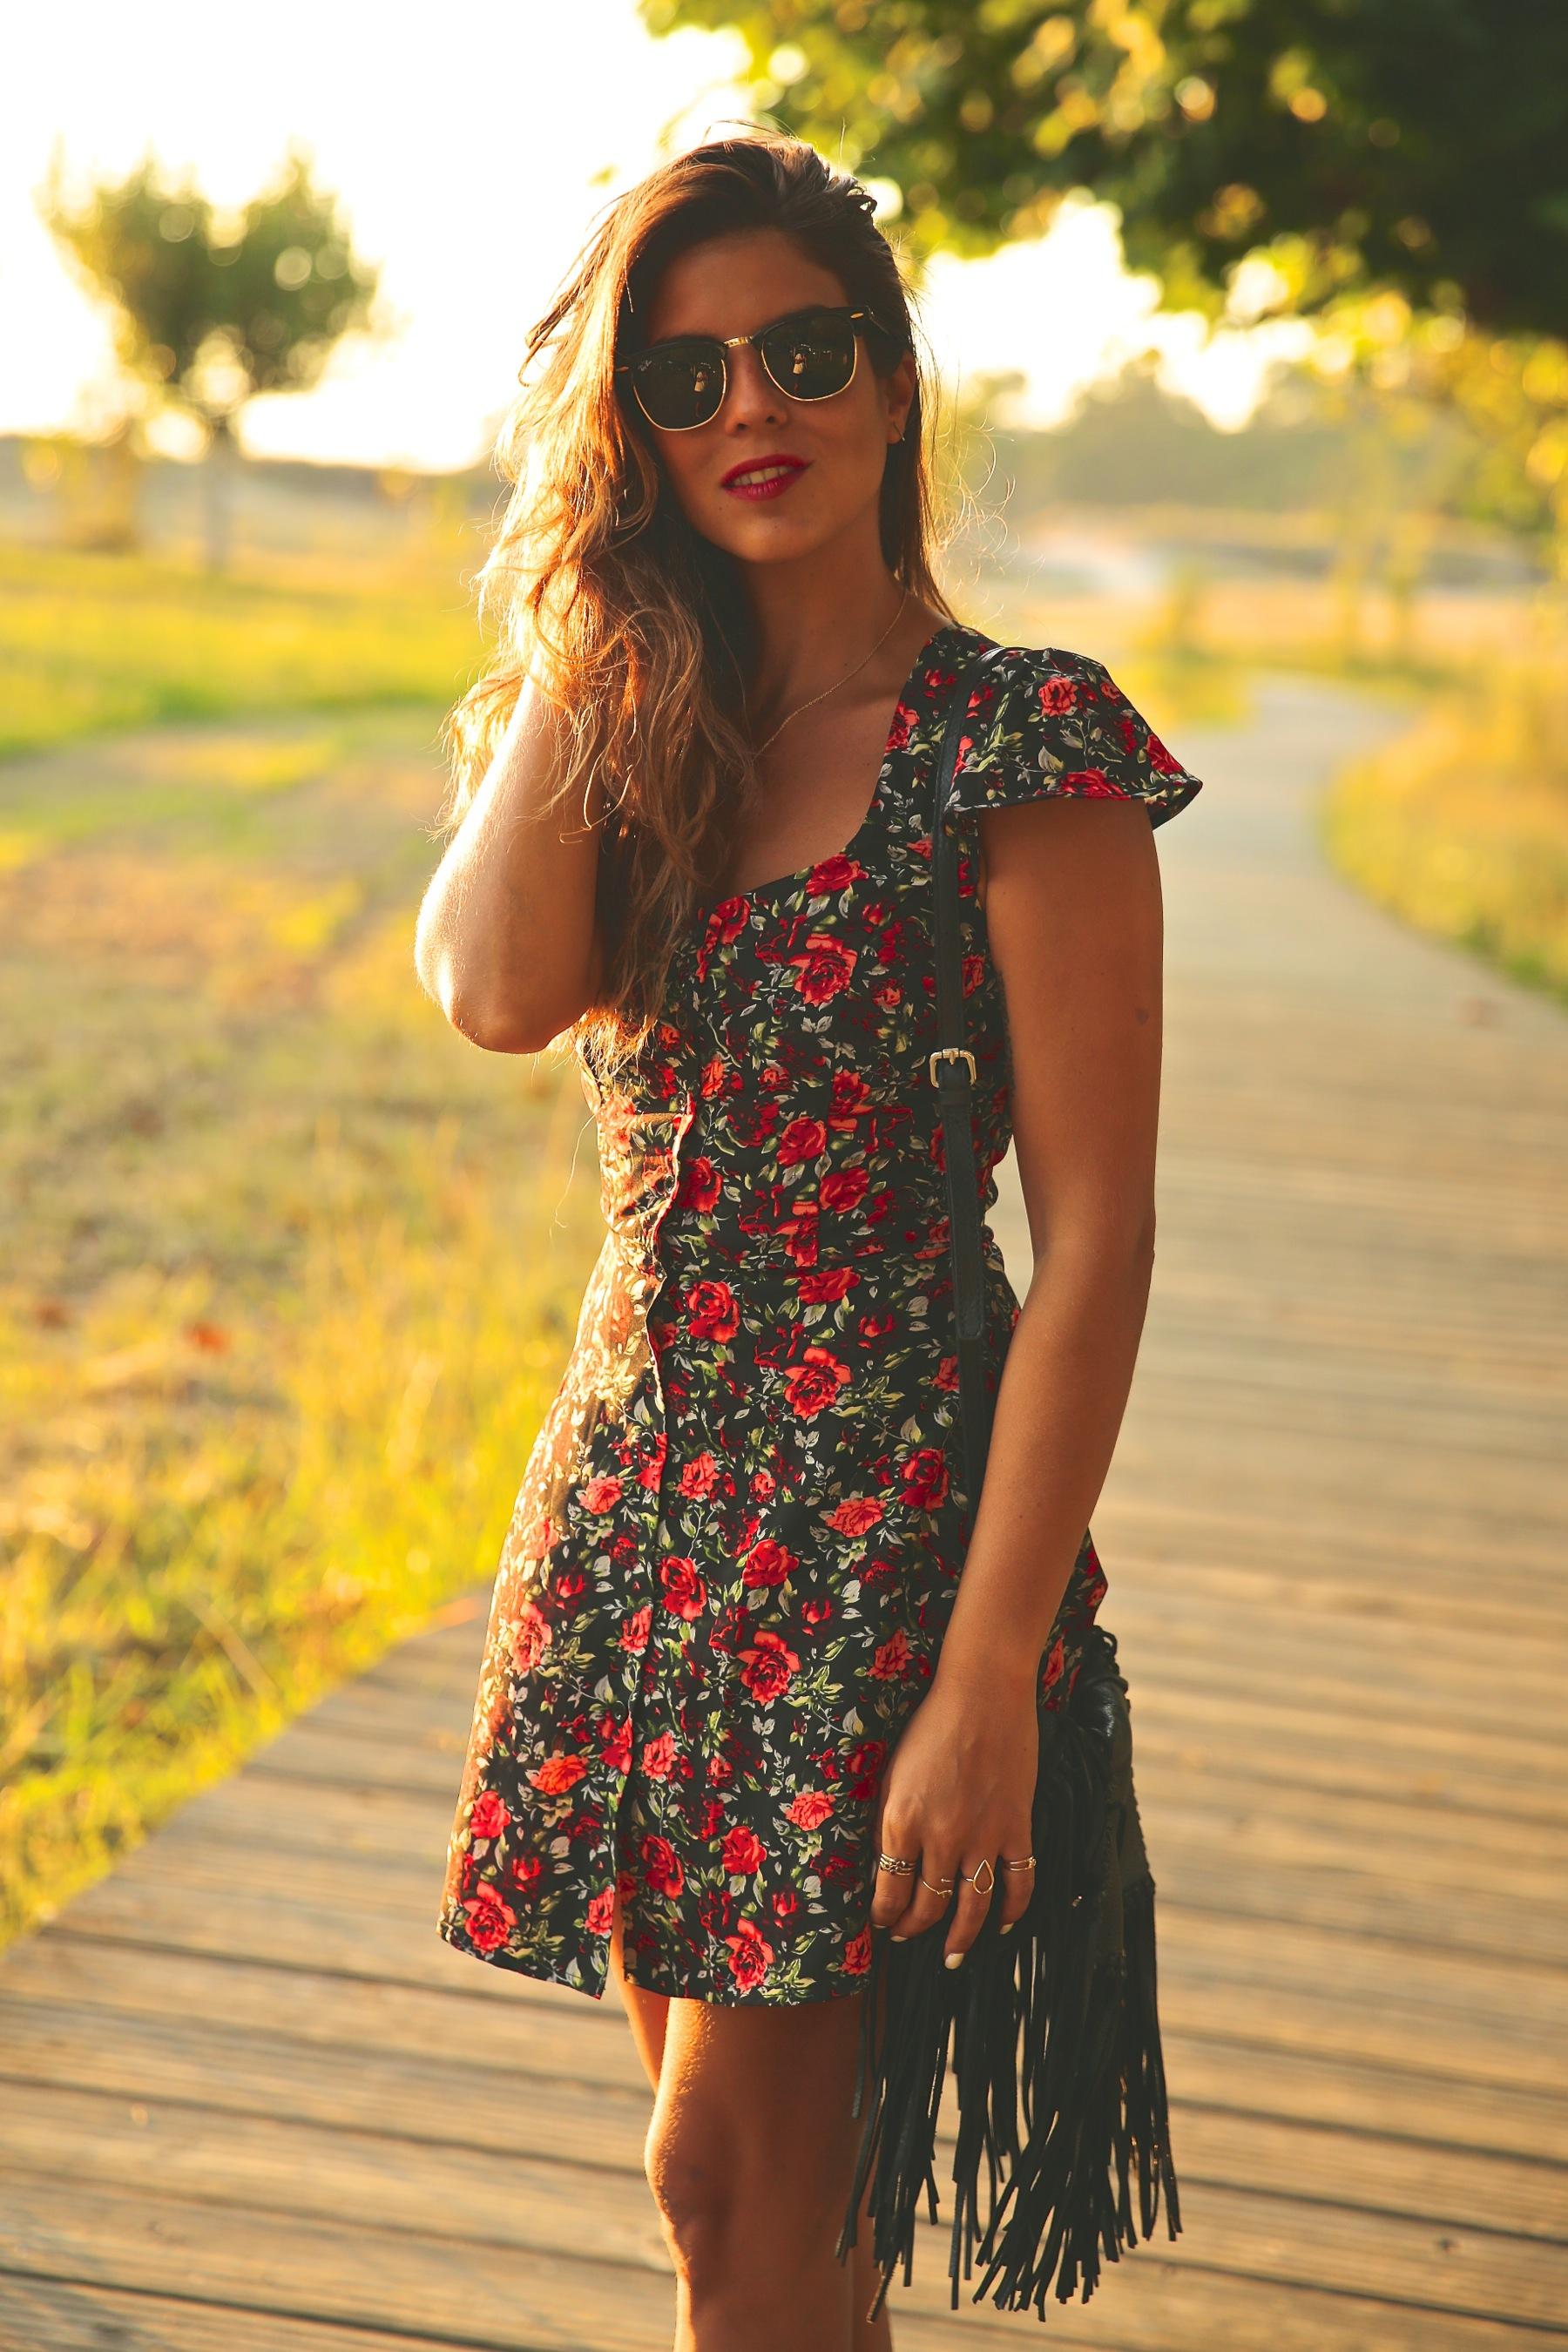 trendy_taste-look-outfit-street_style-ootd-blog-blogger-fashion_spain-moda_españa-flower_print-dress-vestido-flores-sandalias_negras-black_sandals-platforms-sunset-playa-beach-summer-5